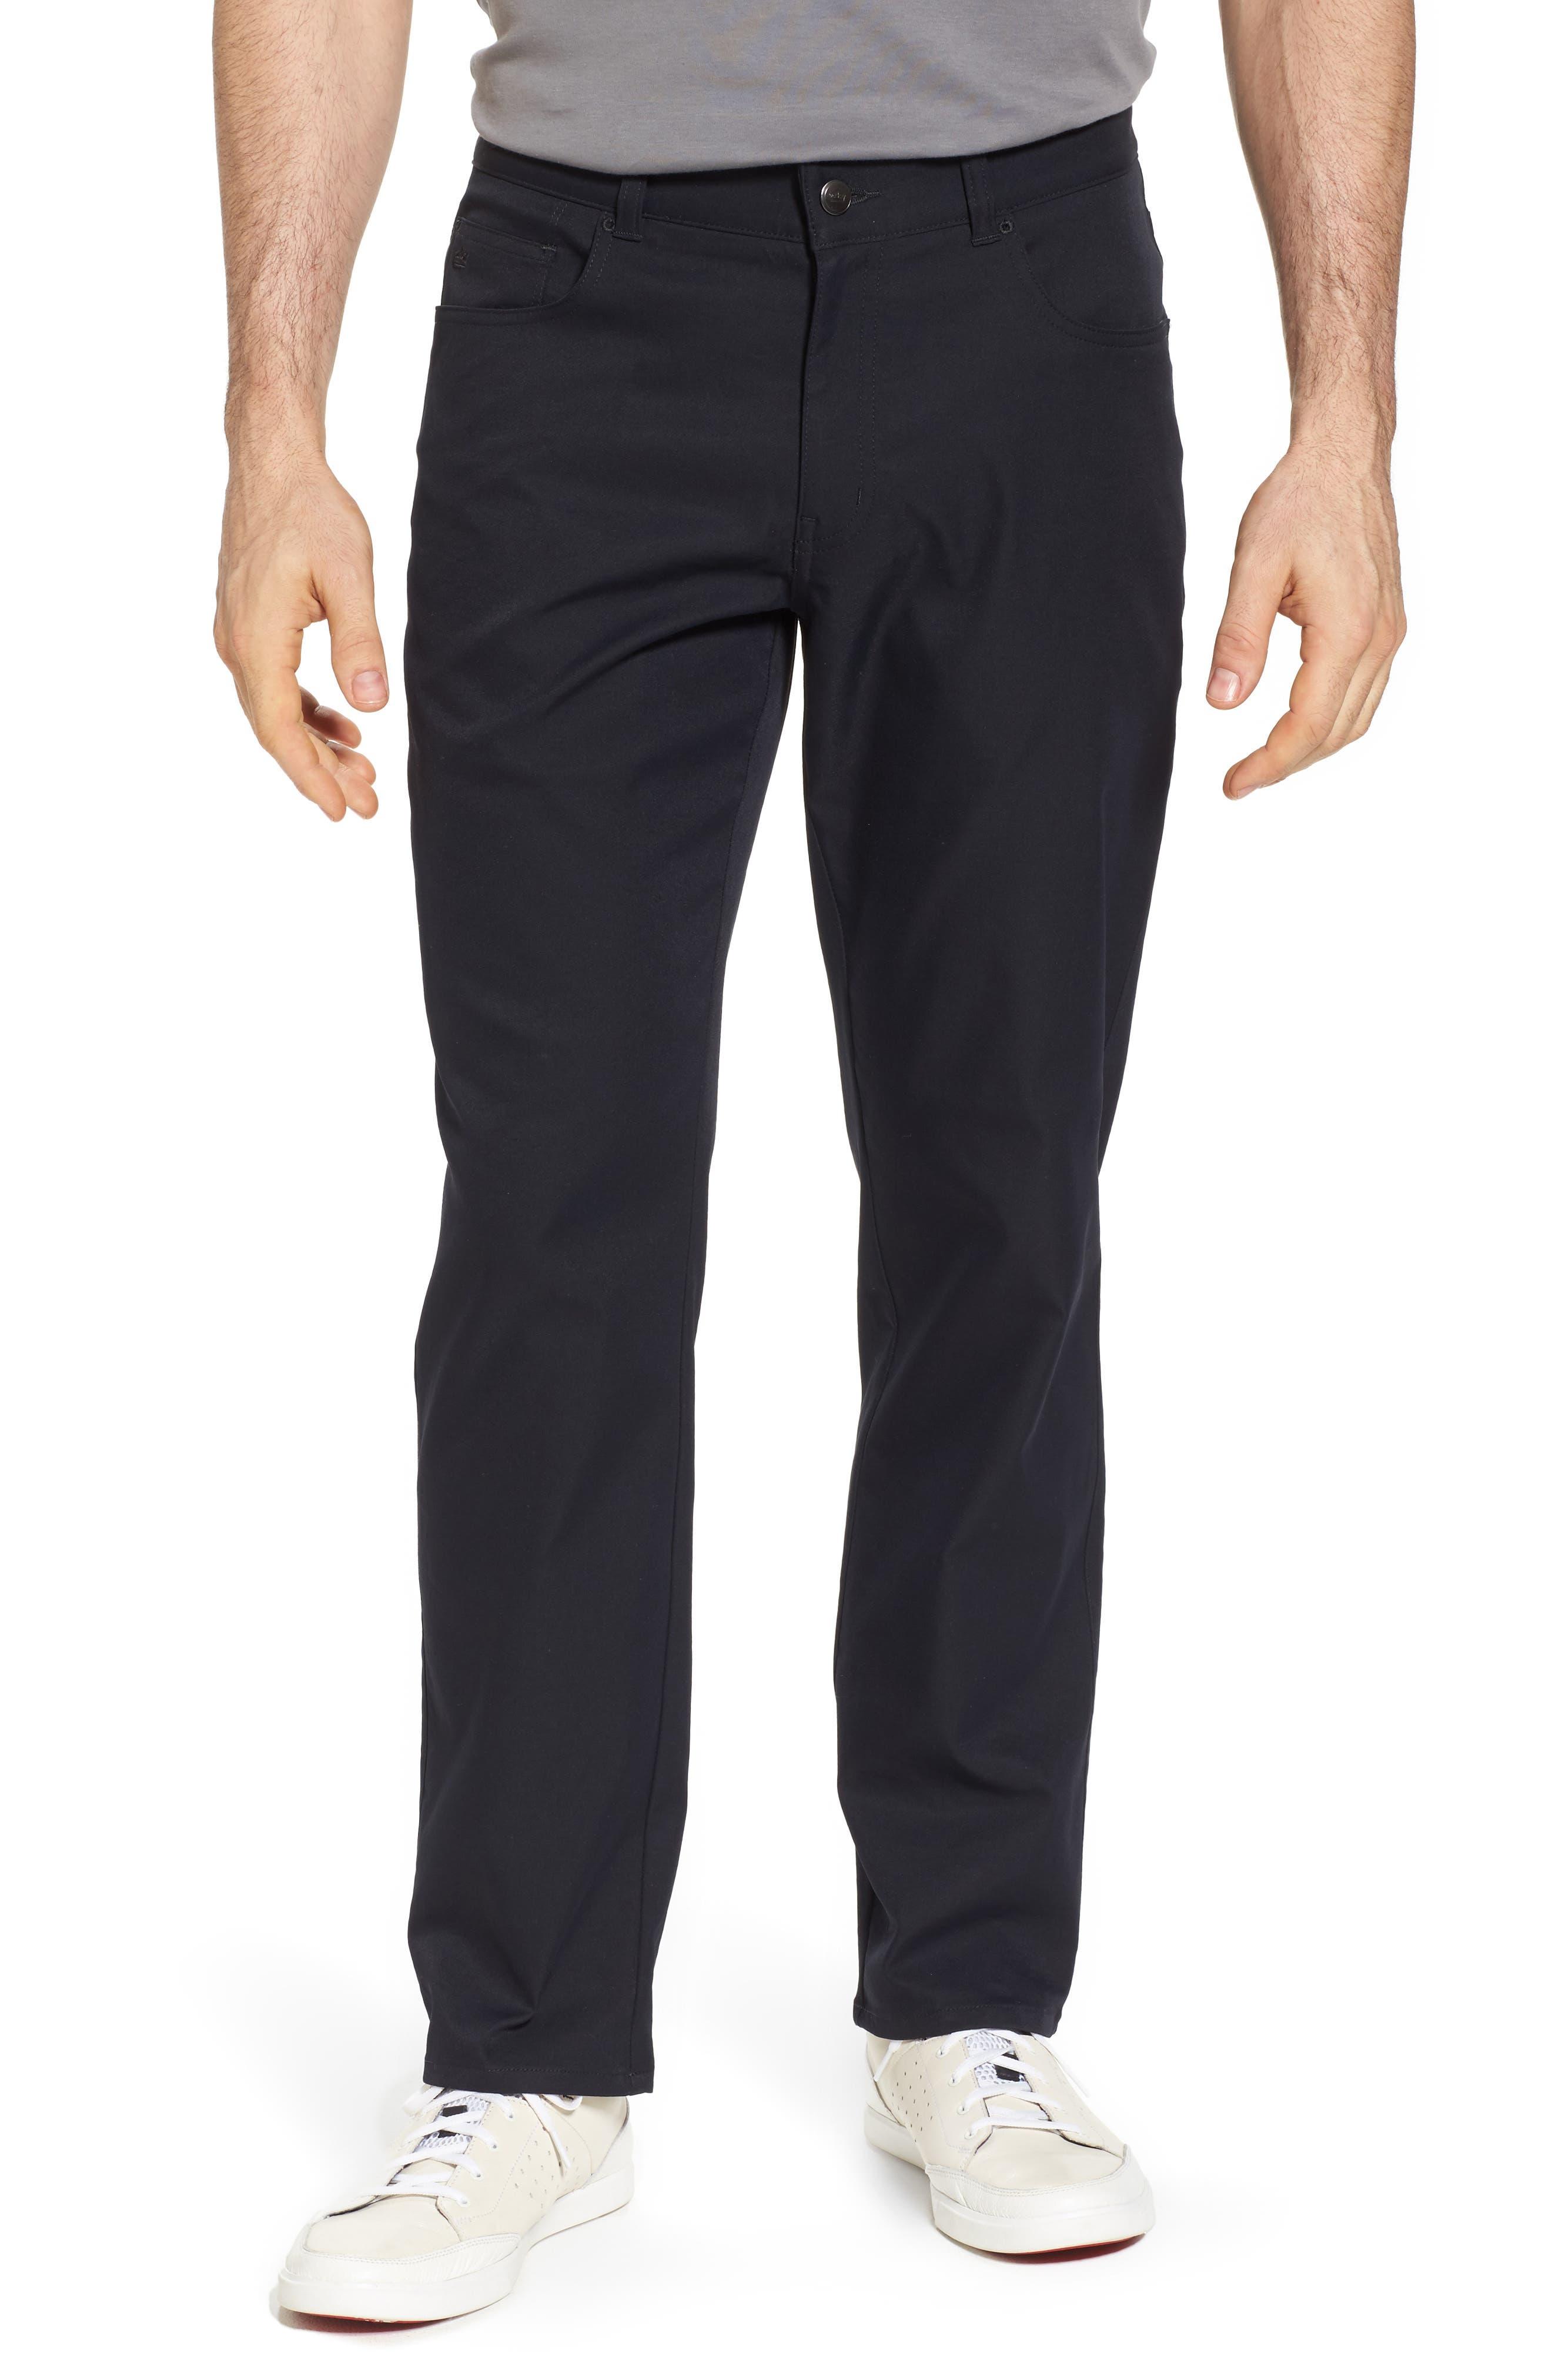 EB66 Performance Six-Pocket Pants,                             Main thumbnail 1, color,                             001